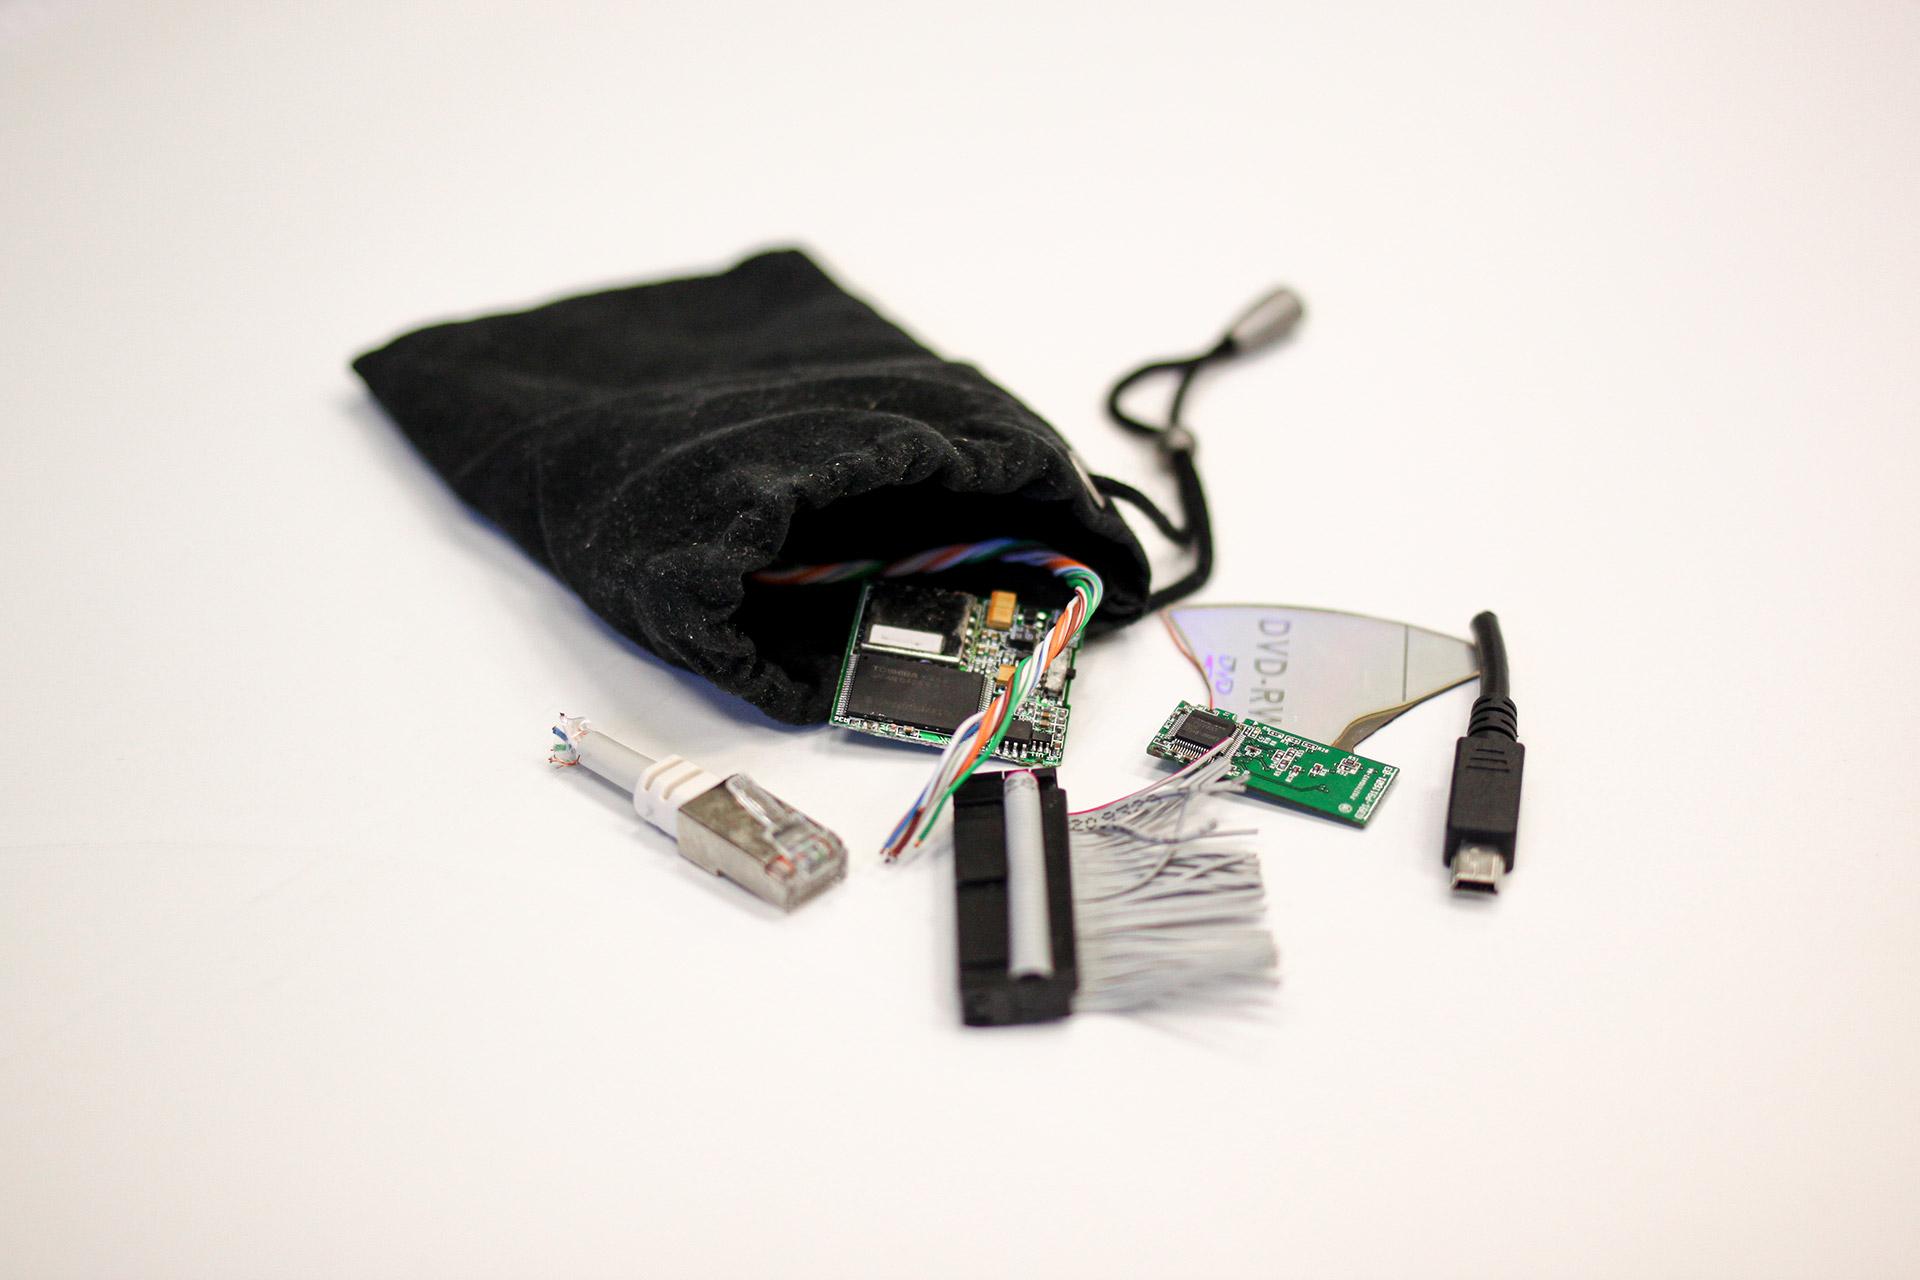 Maraboot kit